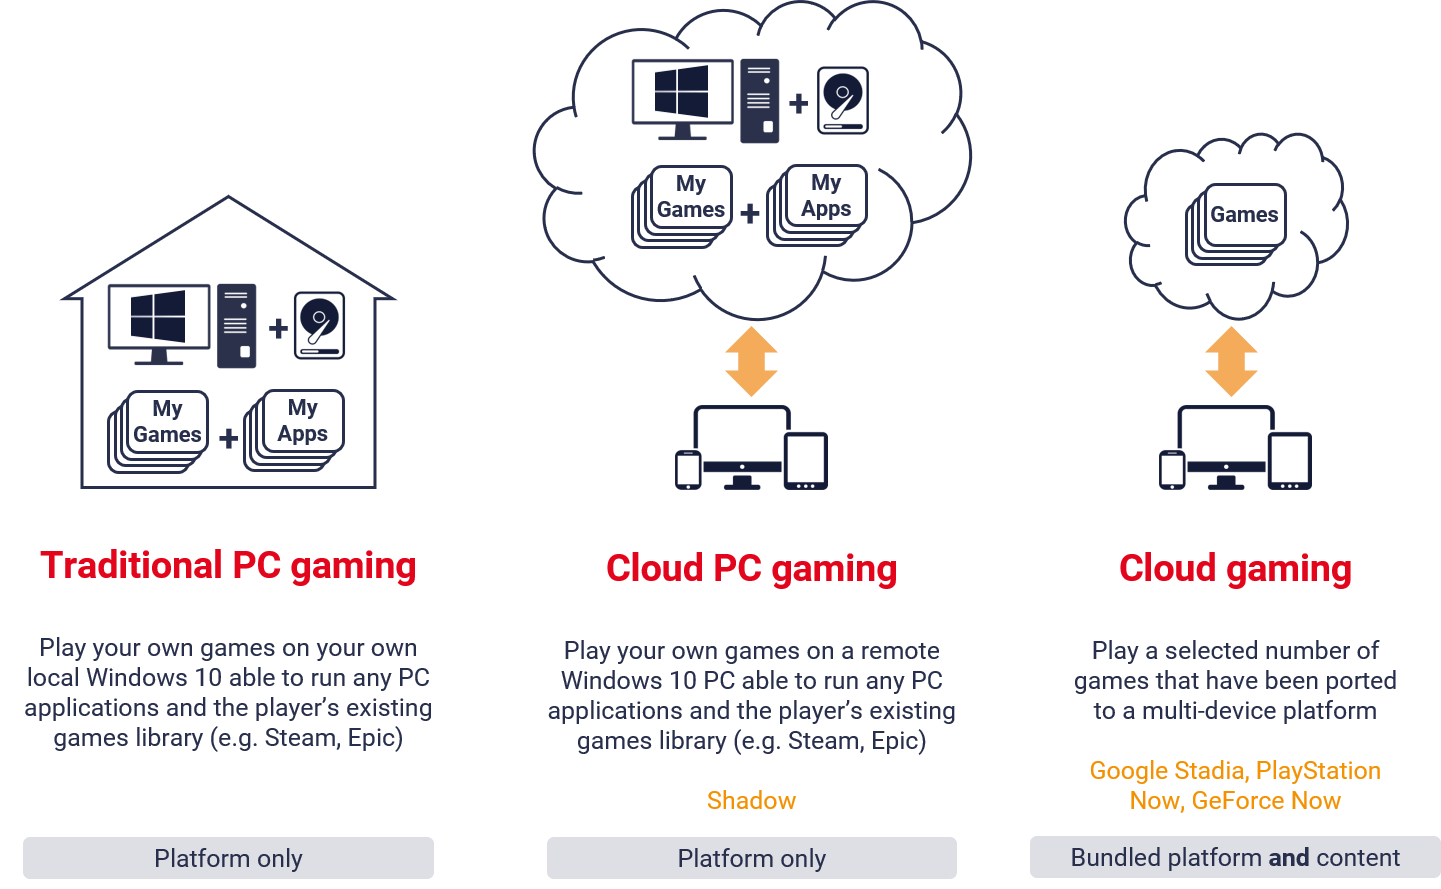 Three cloud gaming business models